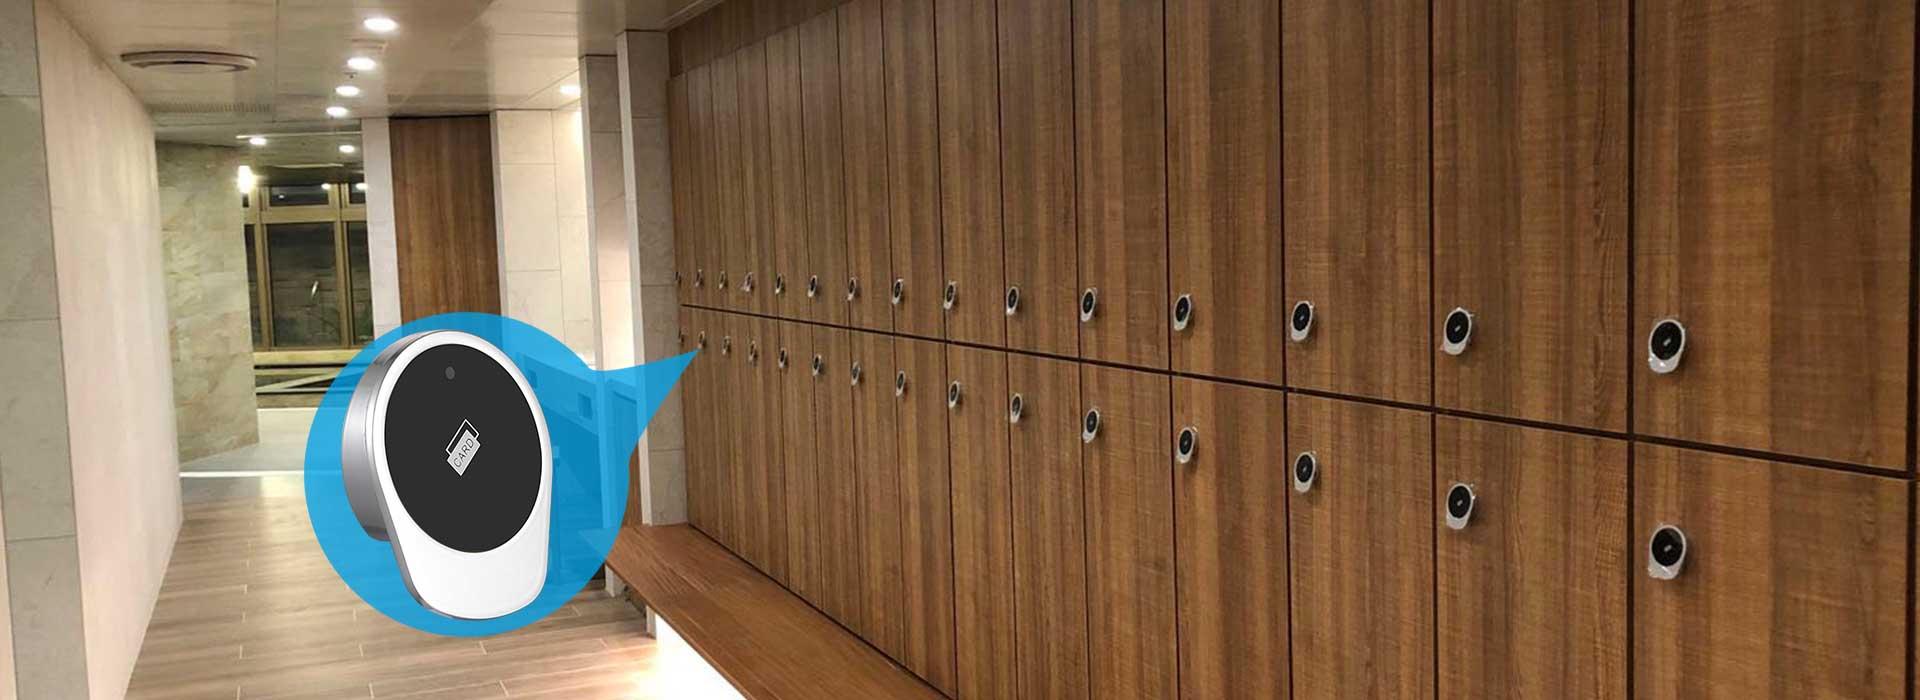 RFID cabinet lock manufacturer